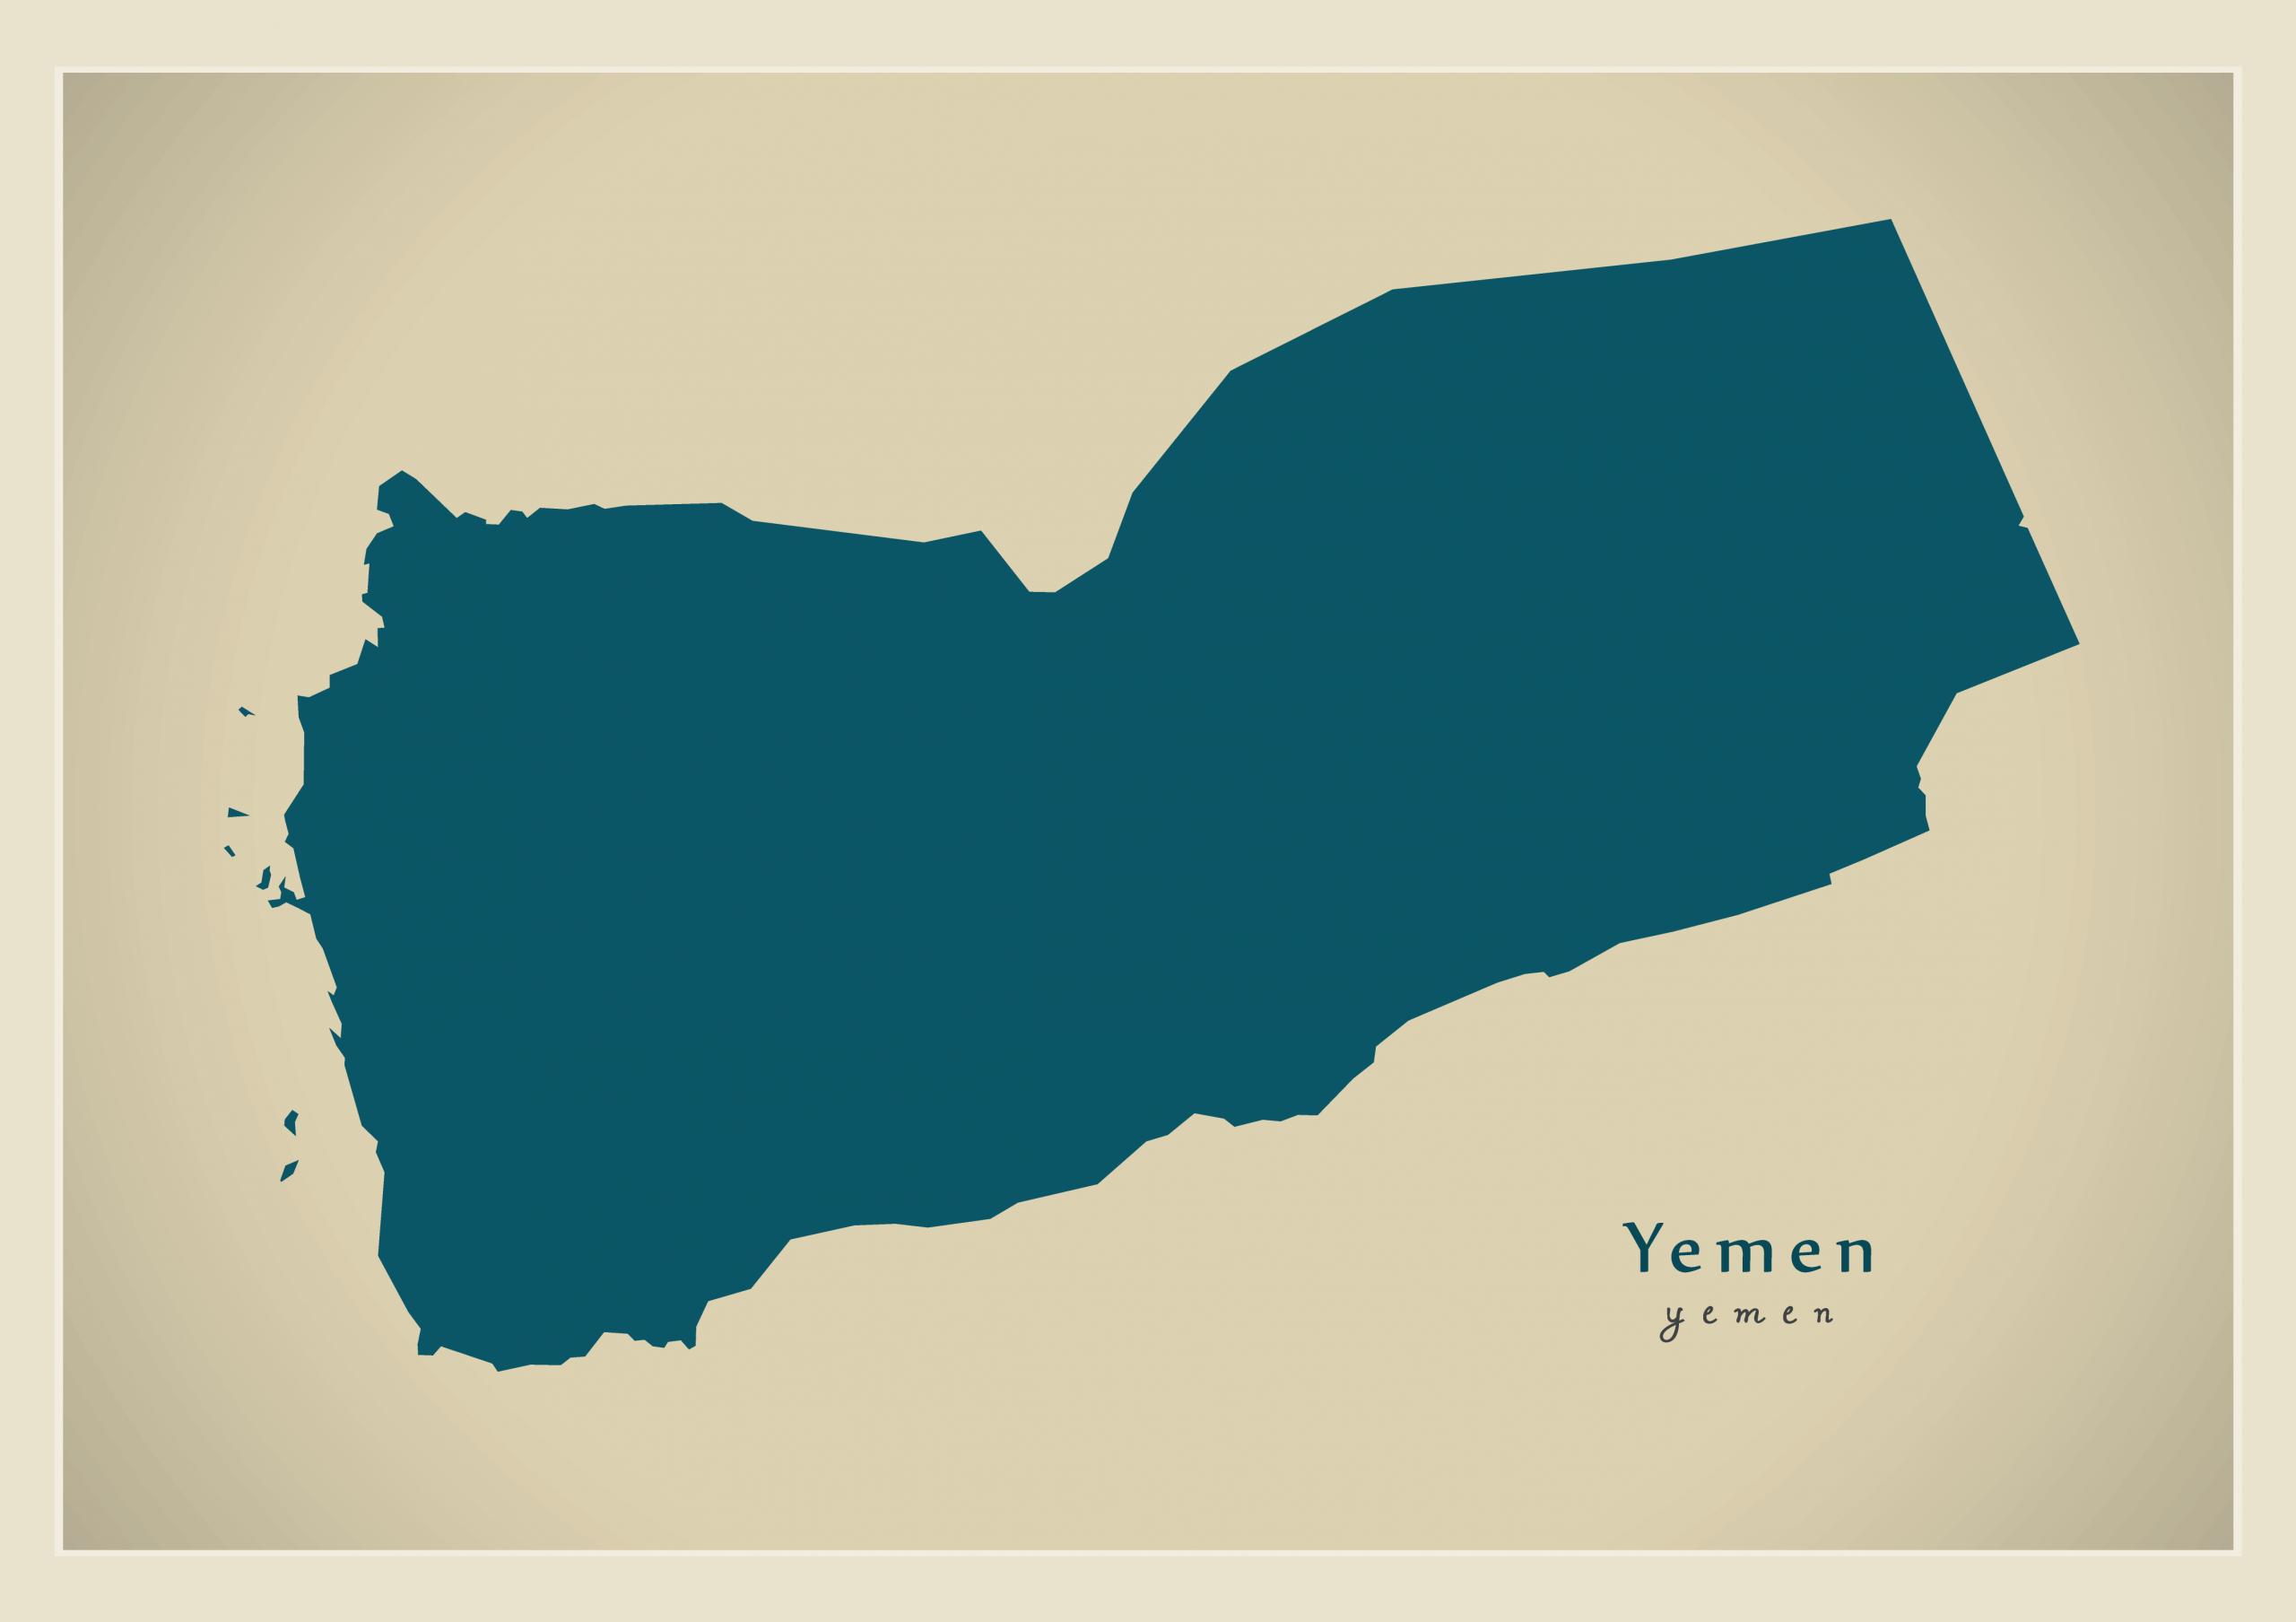 Map outline of Yemen